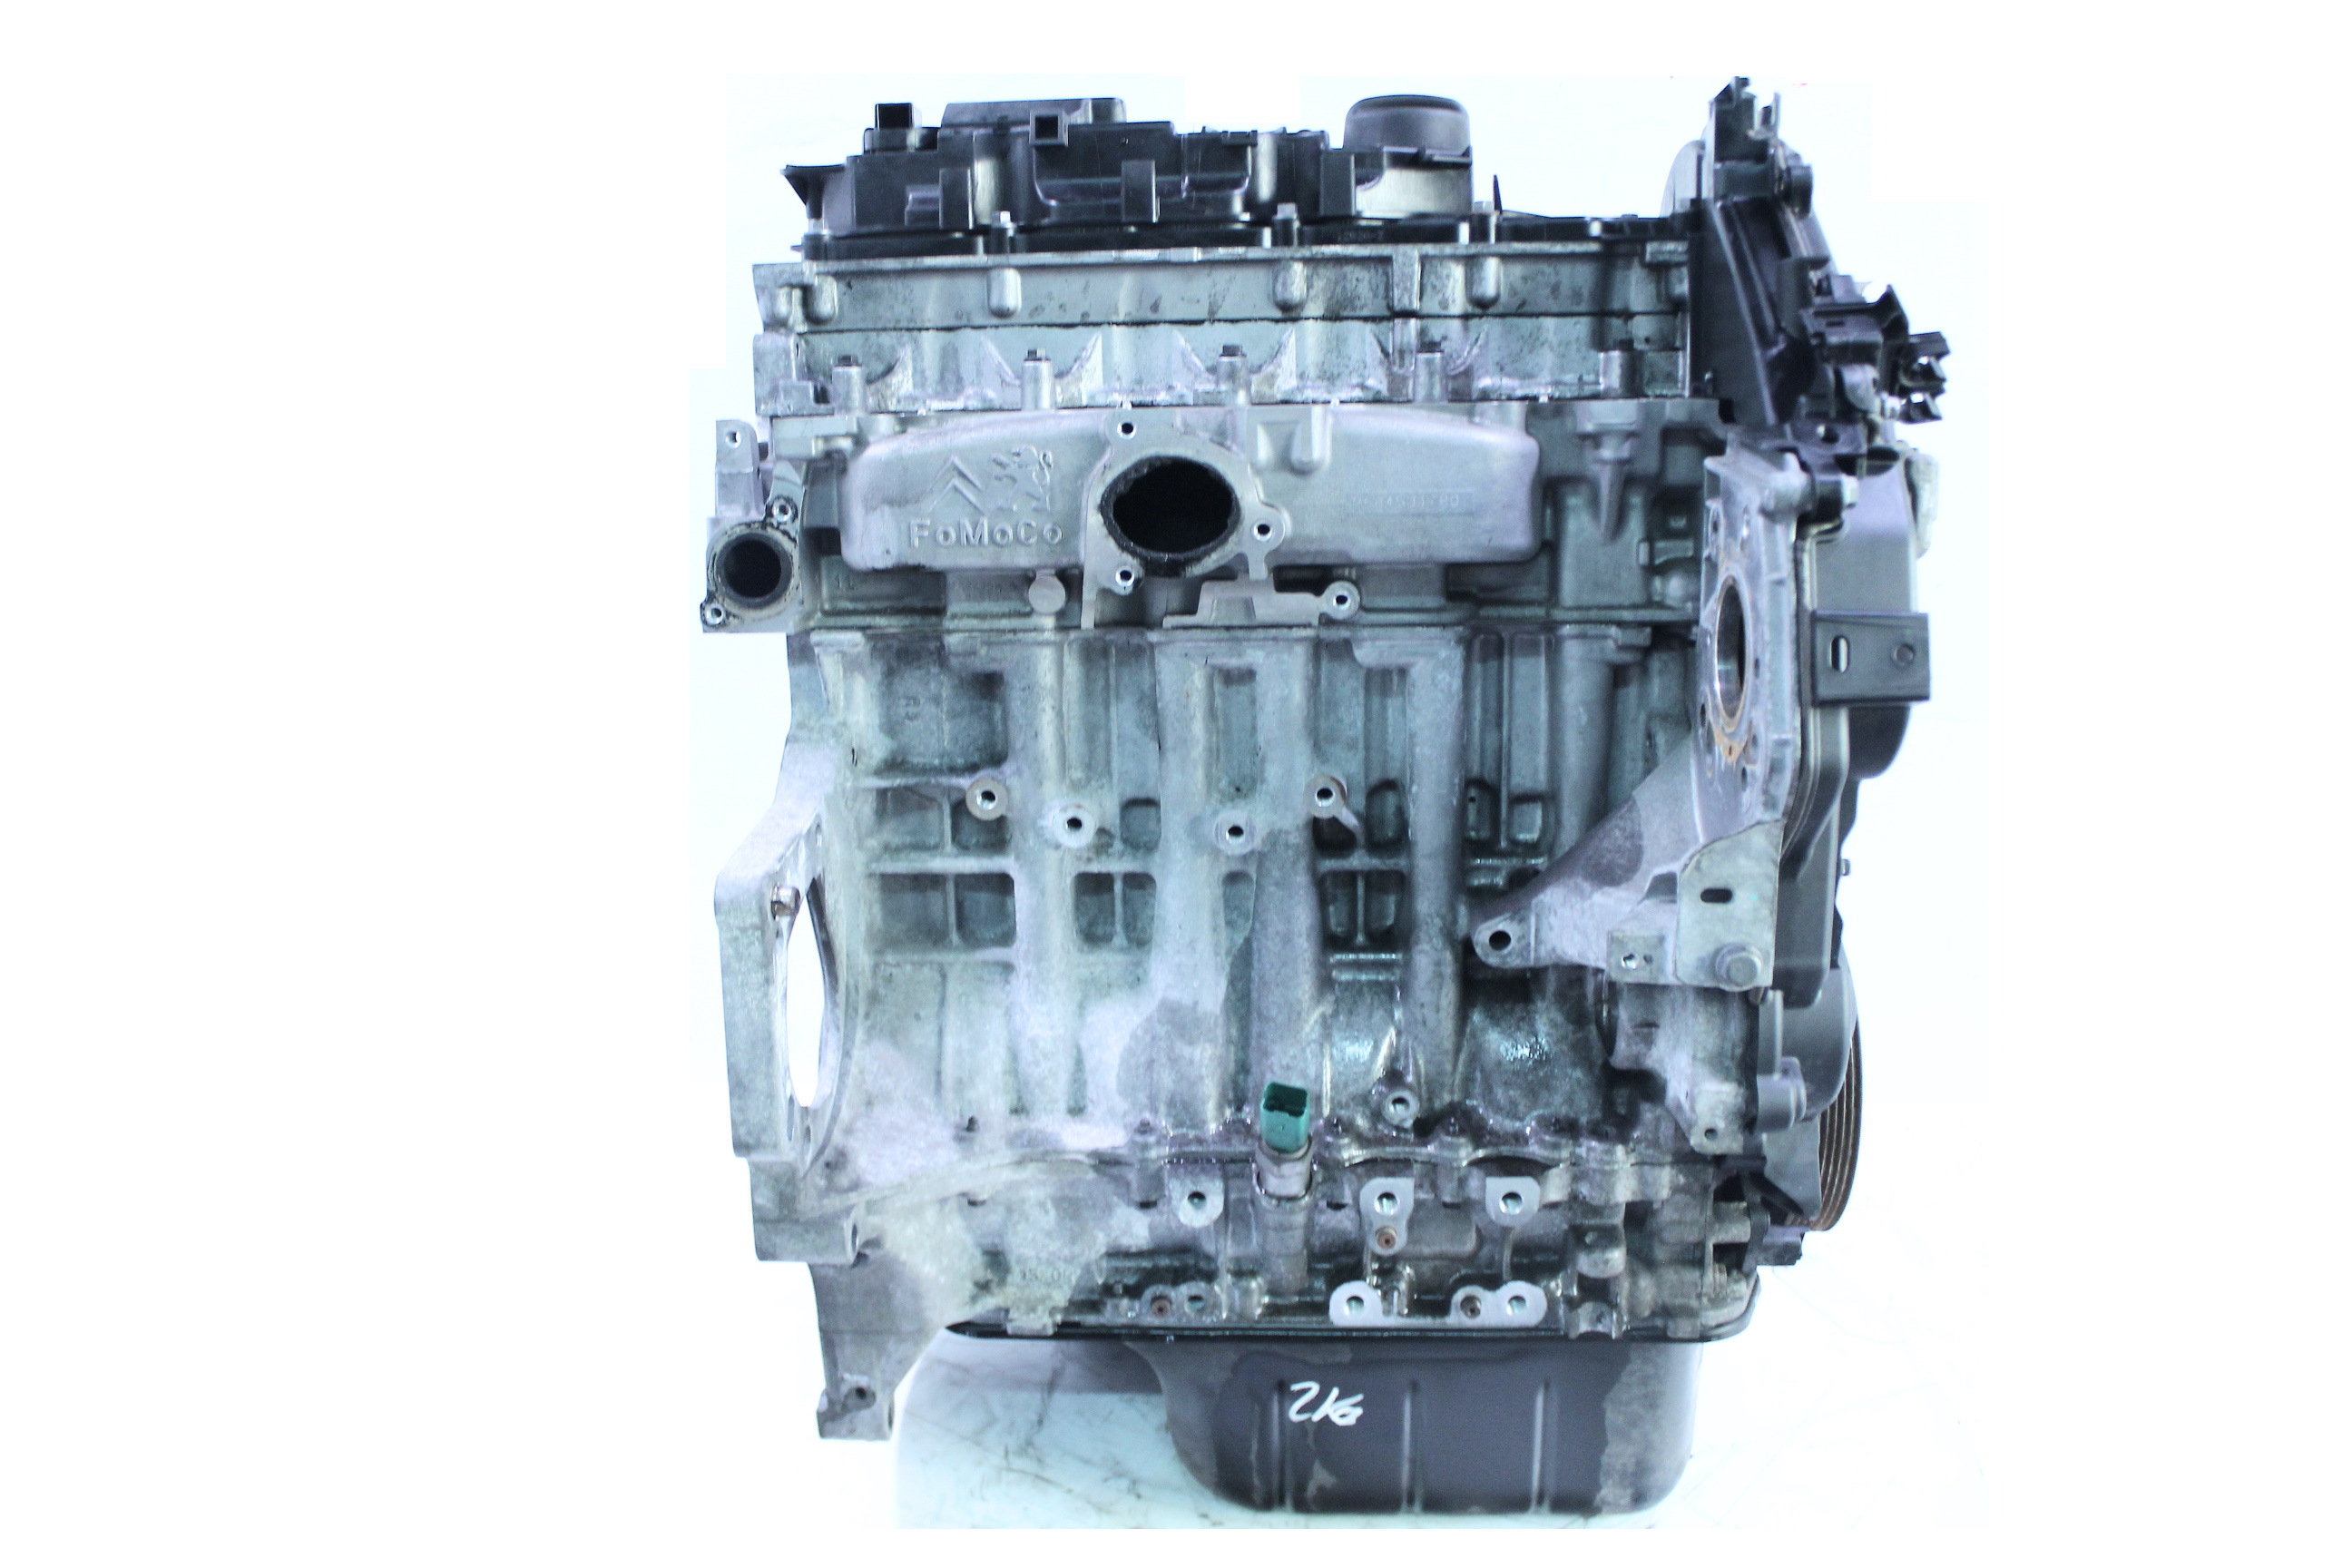 Motor 2013 Citroen Peugeot 2008 3008 4008 5008 1,6 HDi Diesel 9HD DV6C 9H05